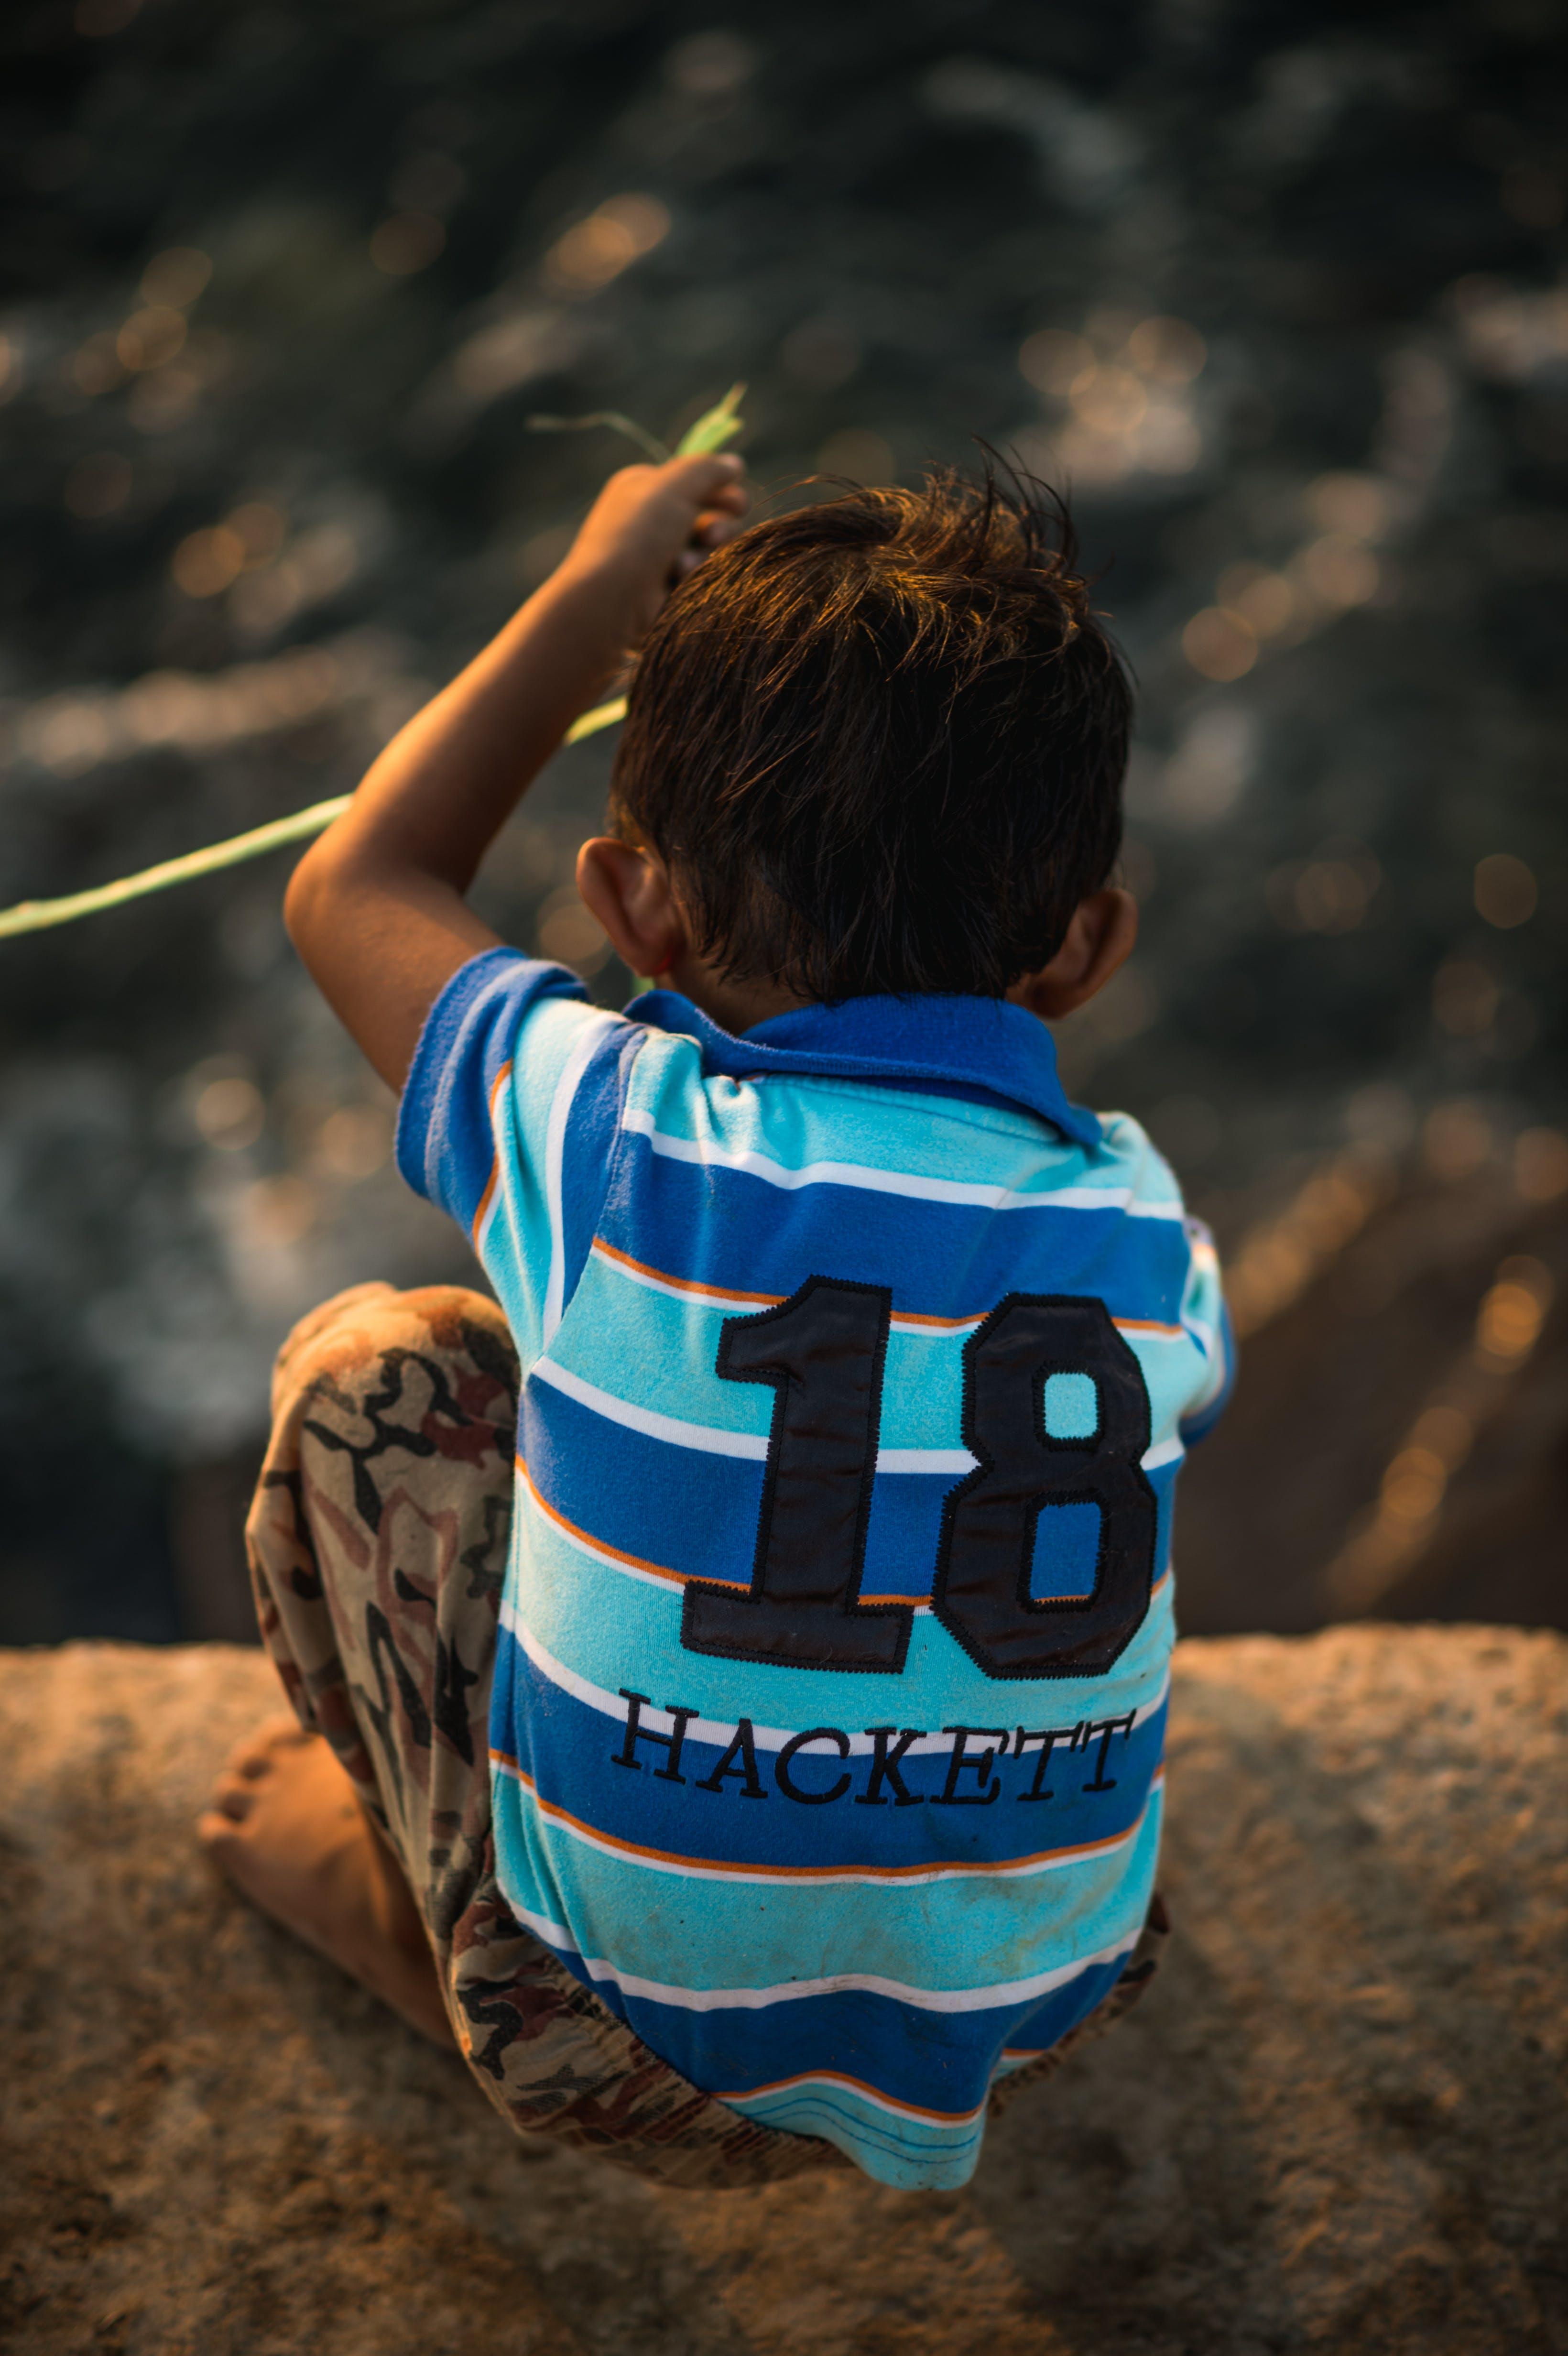 Free stock photo of fishing, light, dream, child